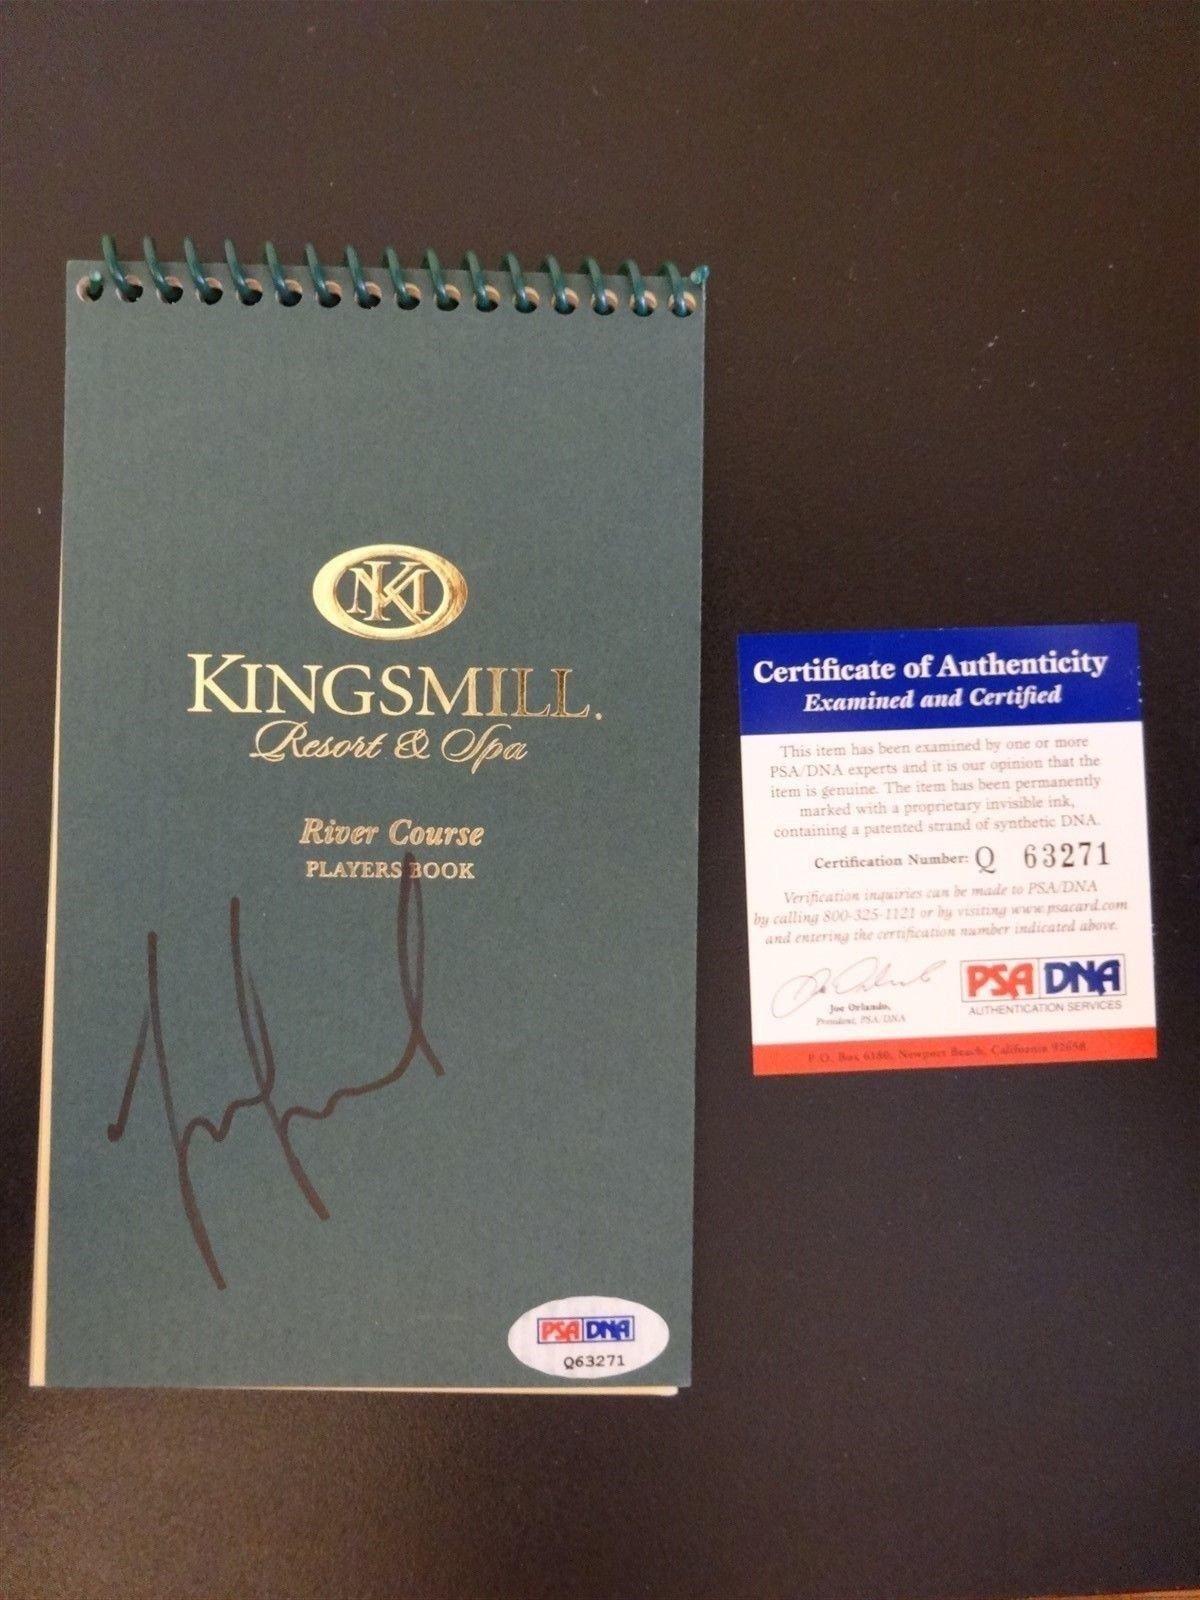 MICHELLE WIE SIGNED AUTO KINGSMILL PLAYERS BOOK PSA #Q63271 AUTOGRAPHED